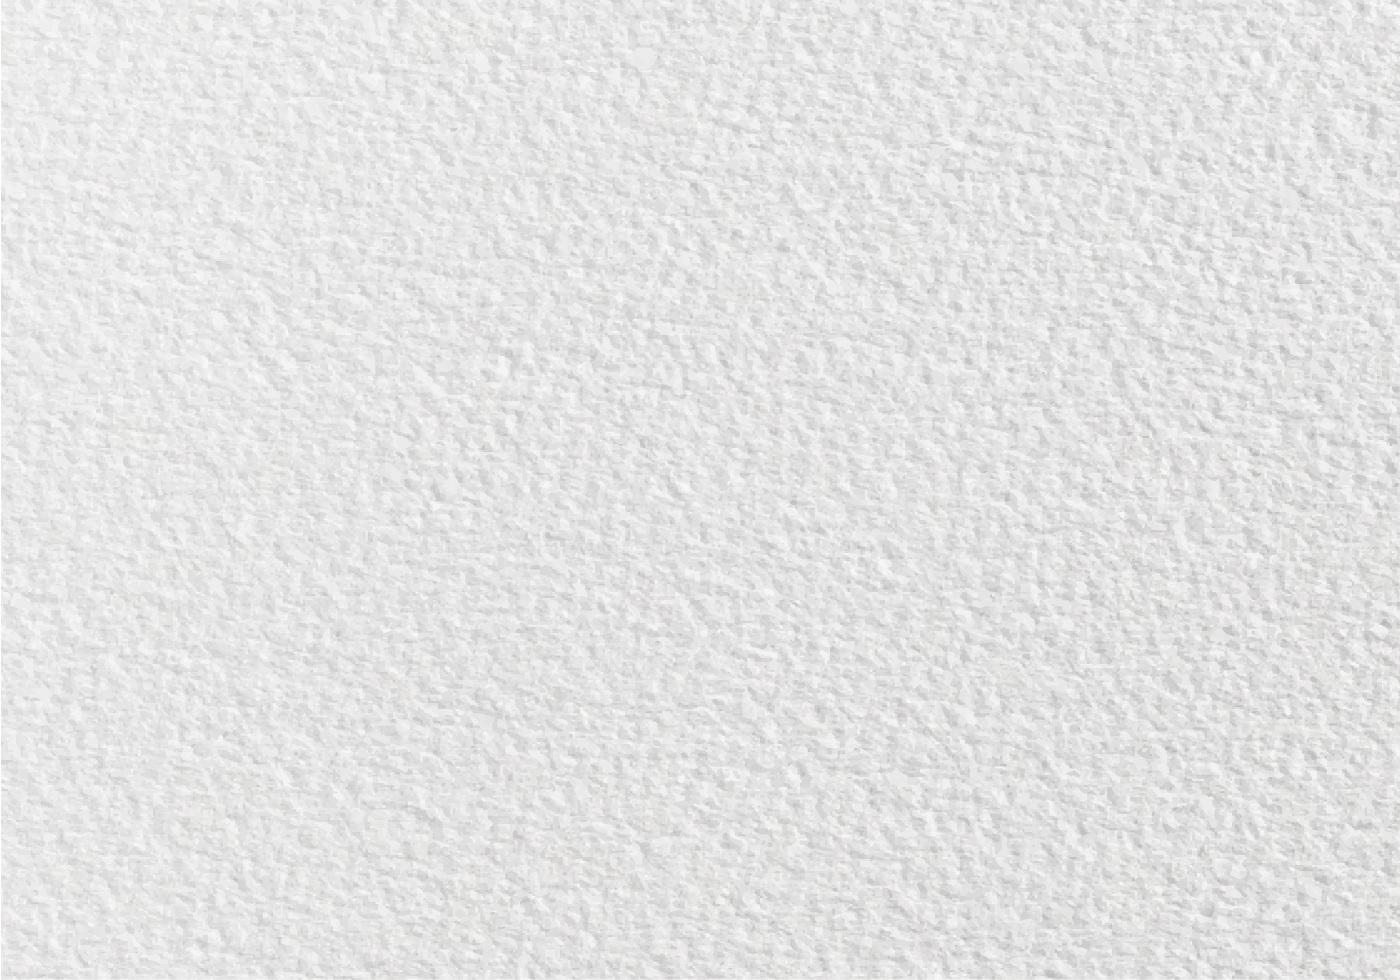 Vector Watercolor Paper Texture Tekstura Bumagi Tvorcheskie